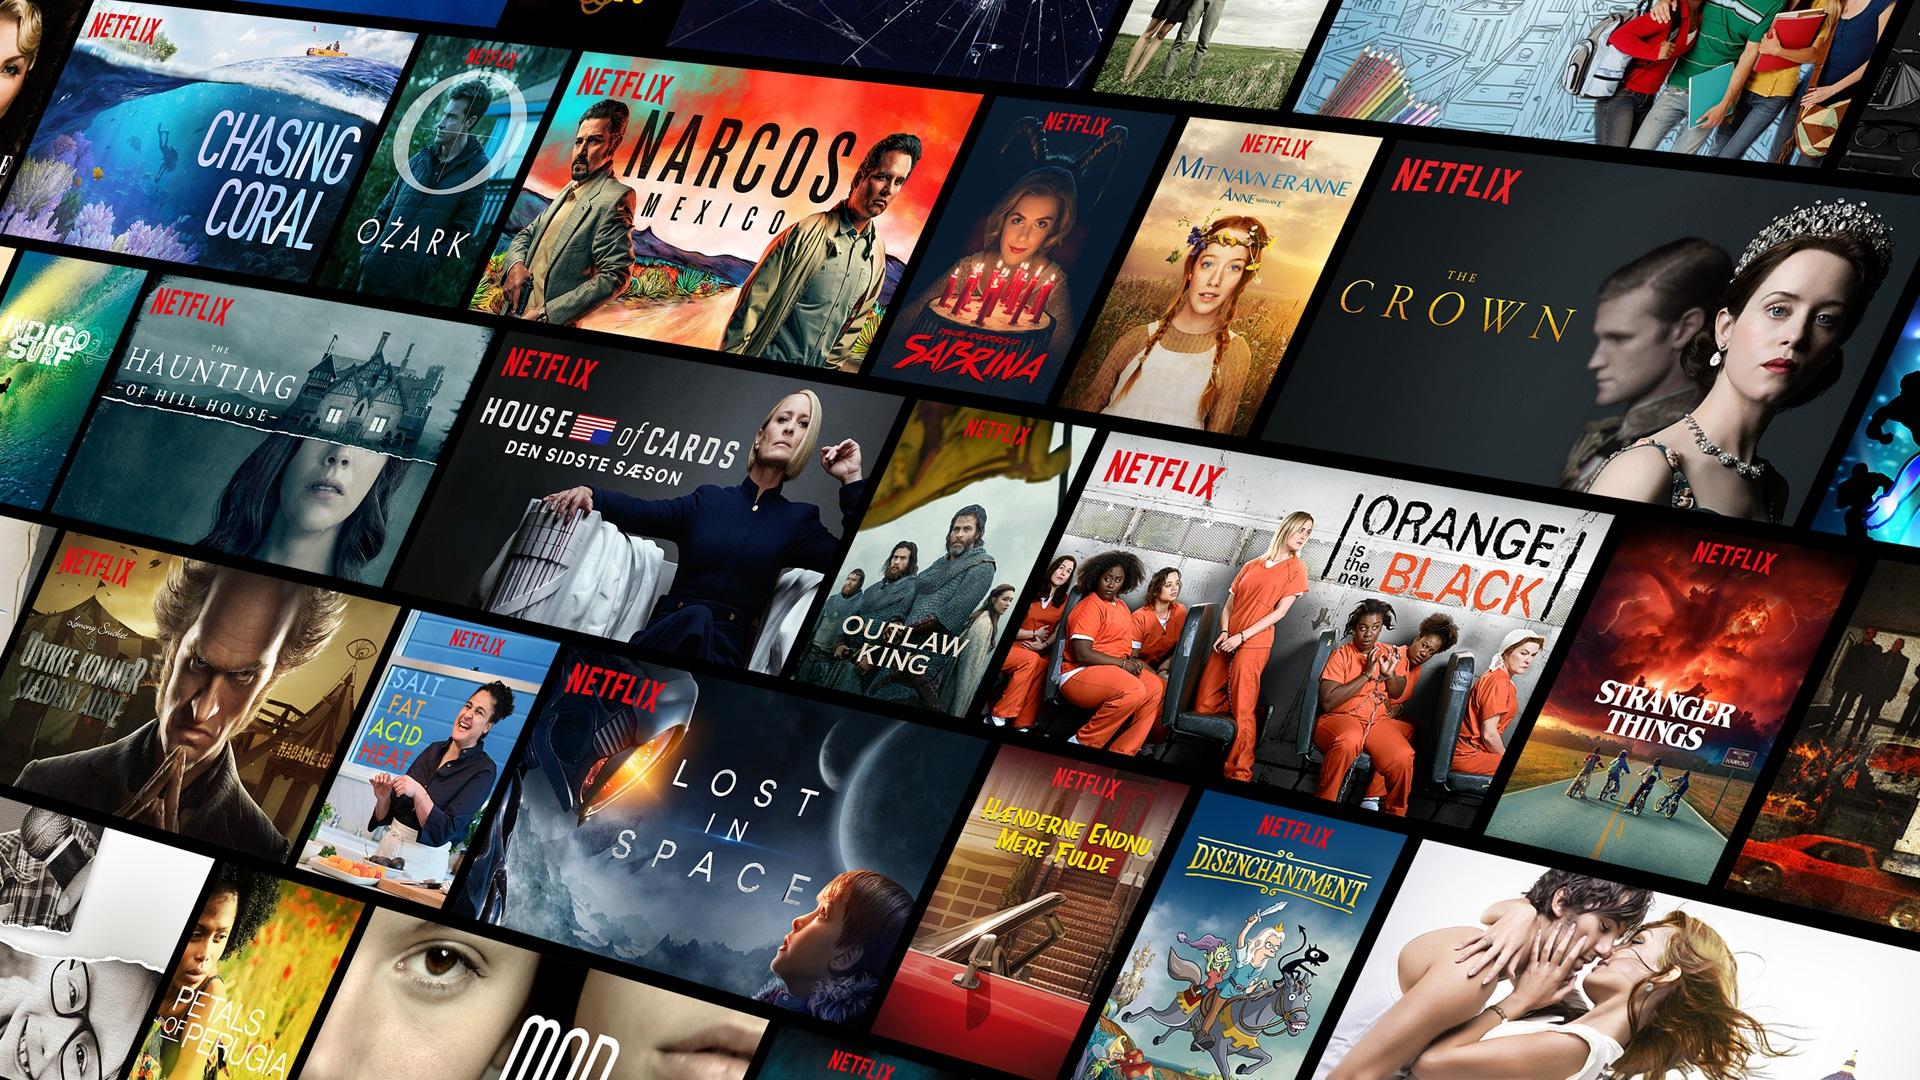 Hulu vs Netflix: which TV streaming platform do you choose?